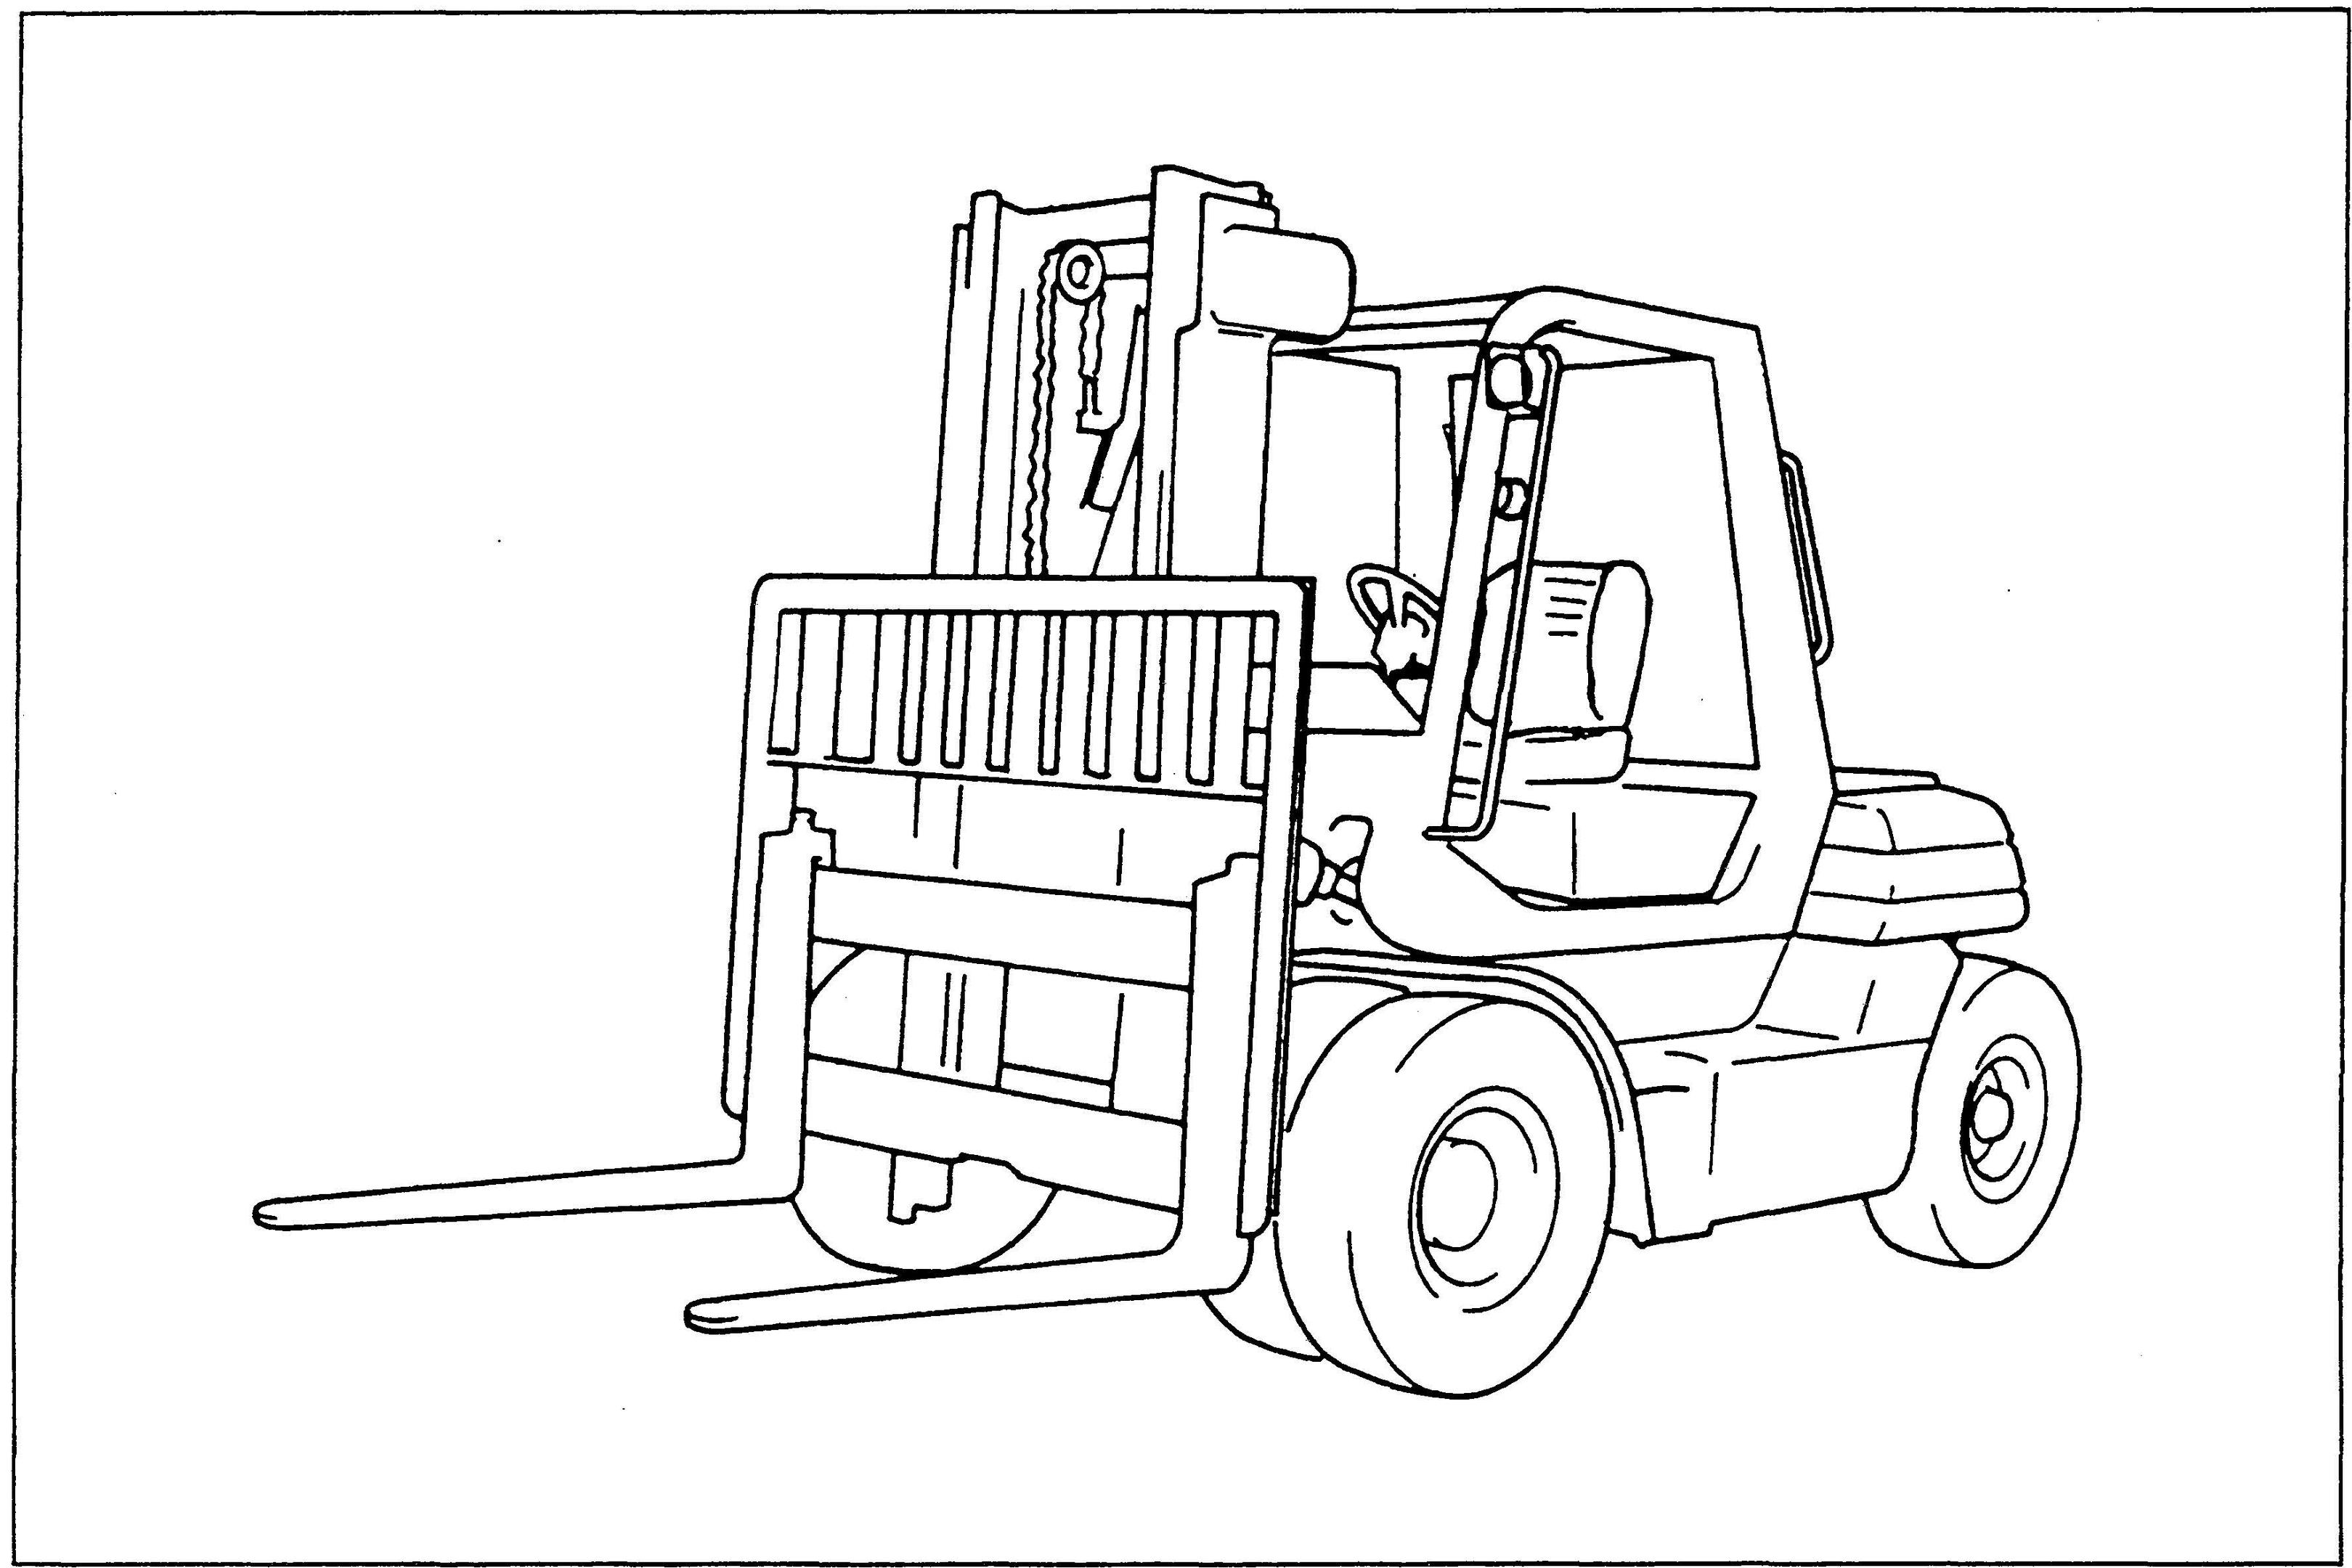 Toyota Forklift 5fd50 80 5fg50 60 5fdm60 70 Series Ser Adding Reverse  Lights Wiring-Diagram Nissan Forklift Wiring Diagram Model 70